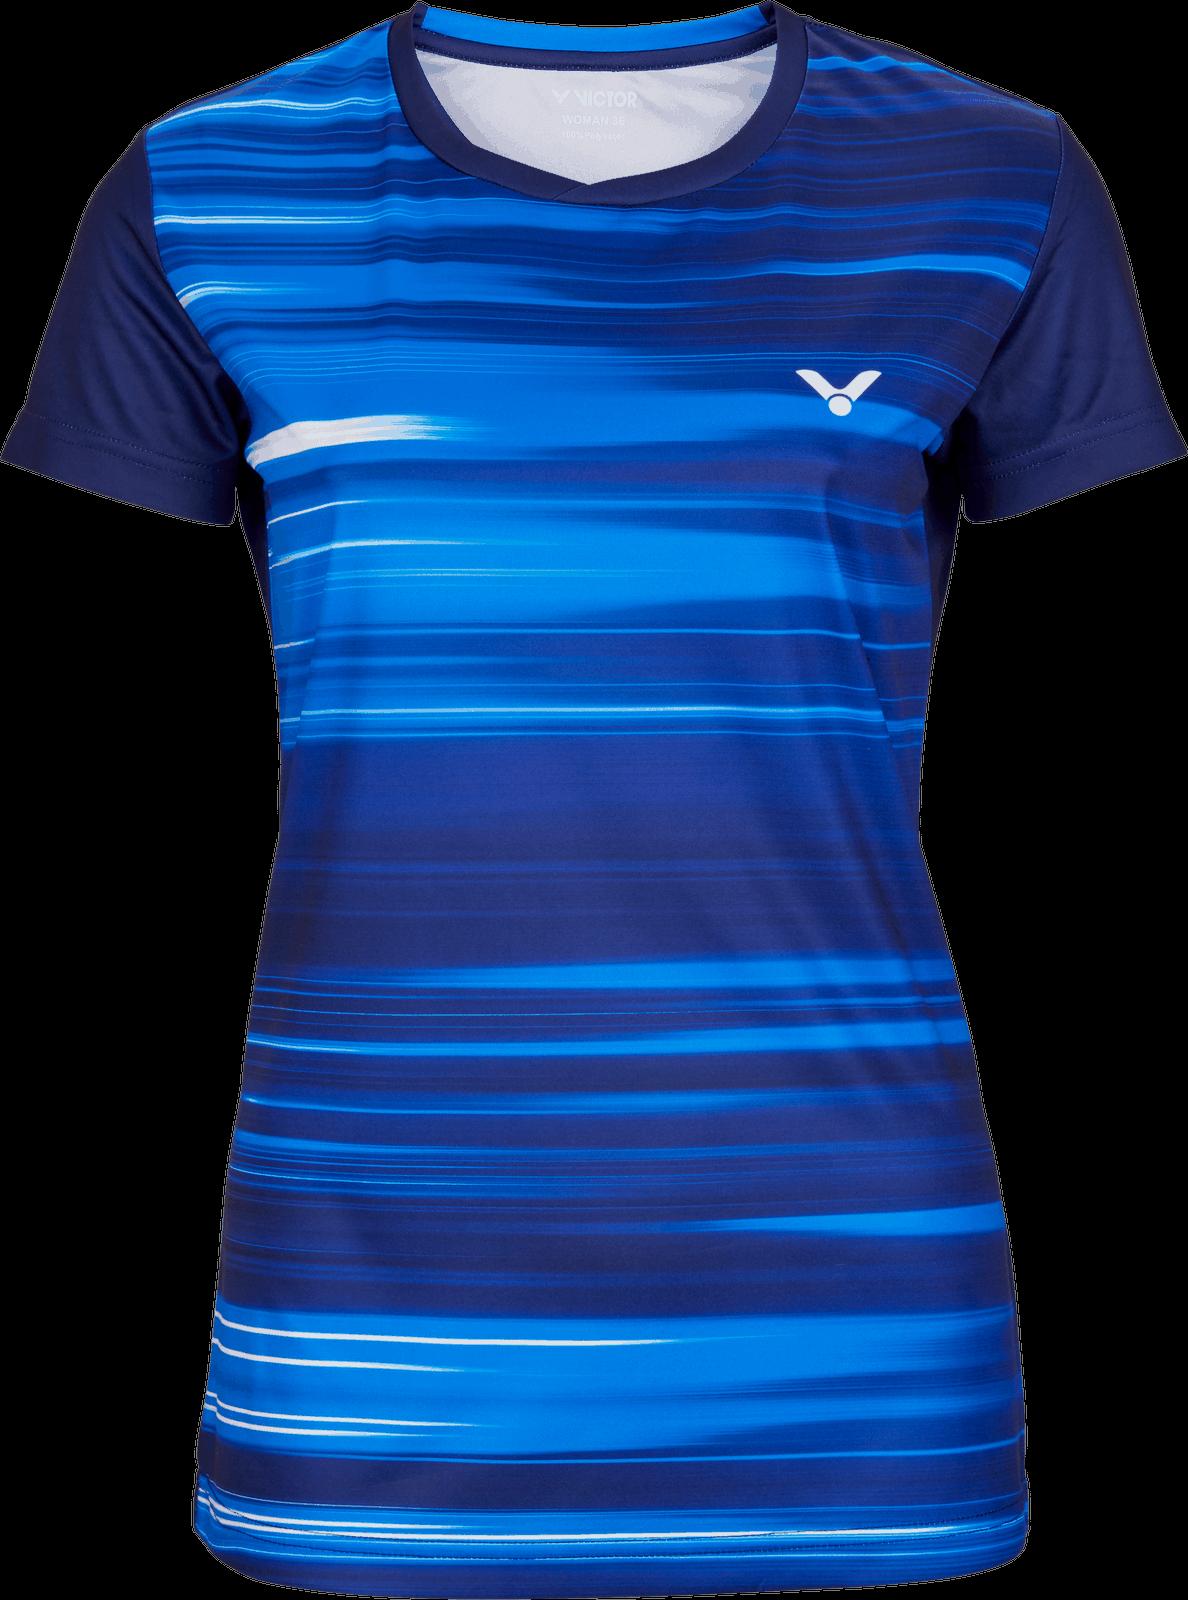 VICTOR T-Shirt T-04100 B